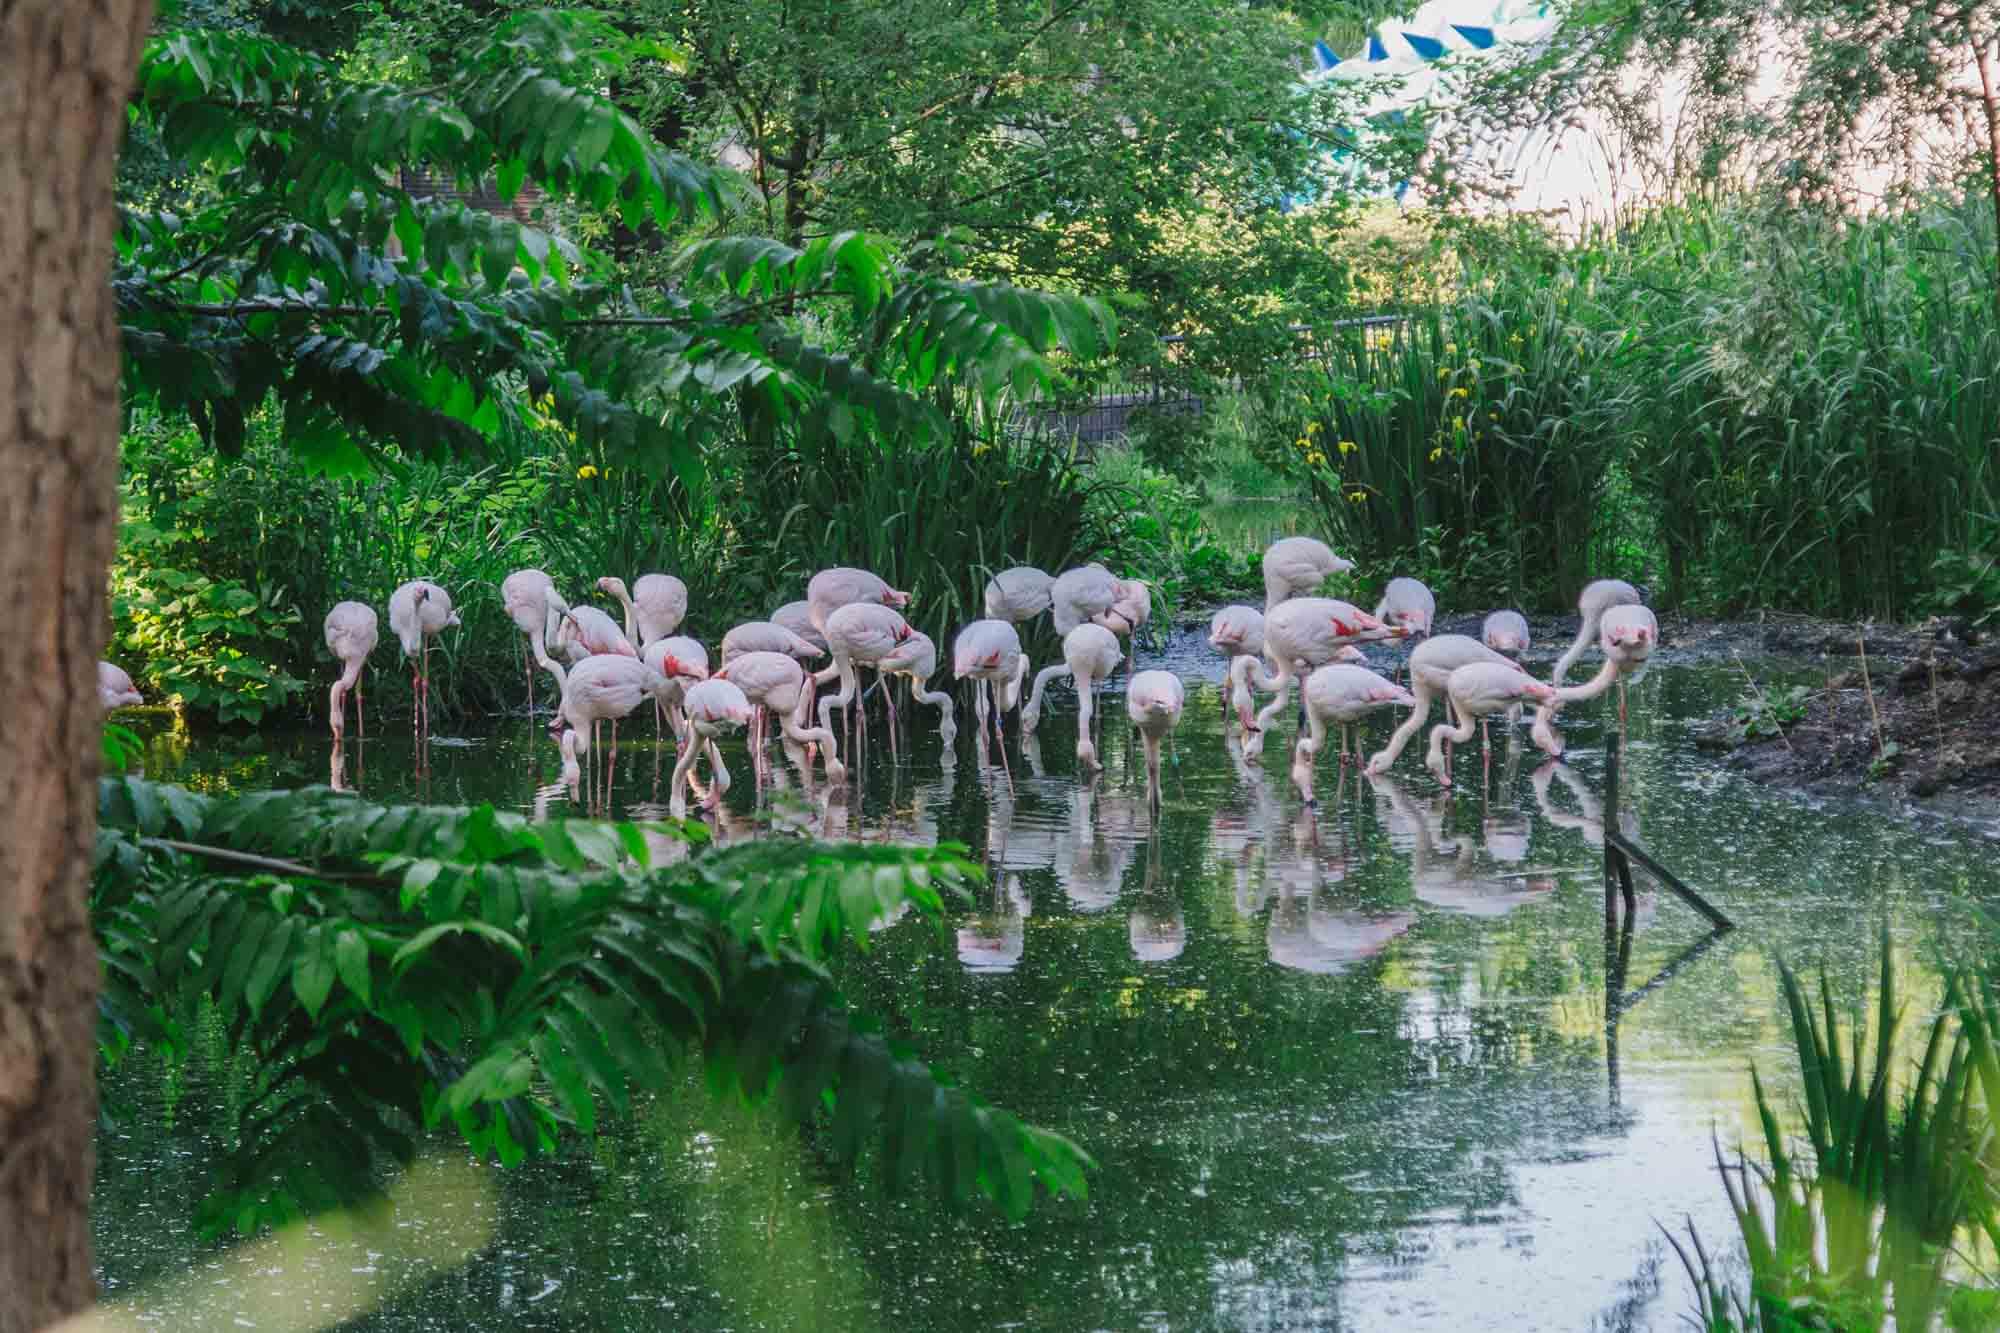 London Zoo - Flamingos